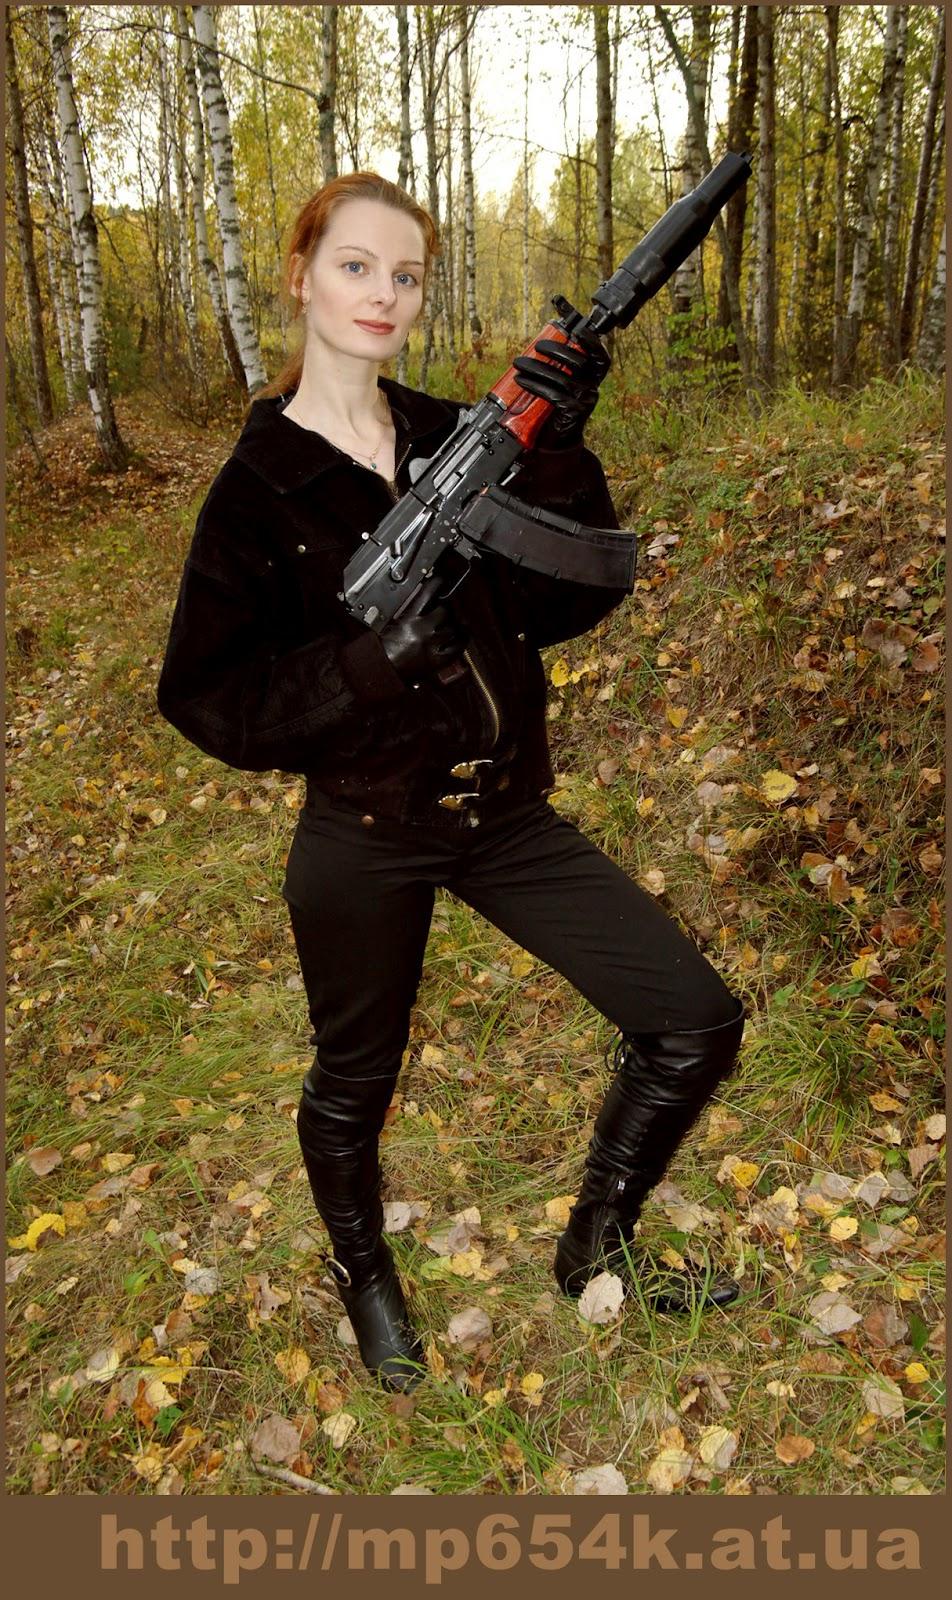 girls n guns